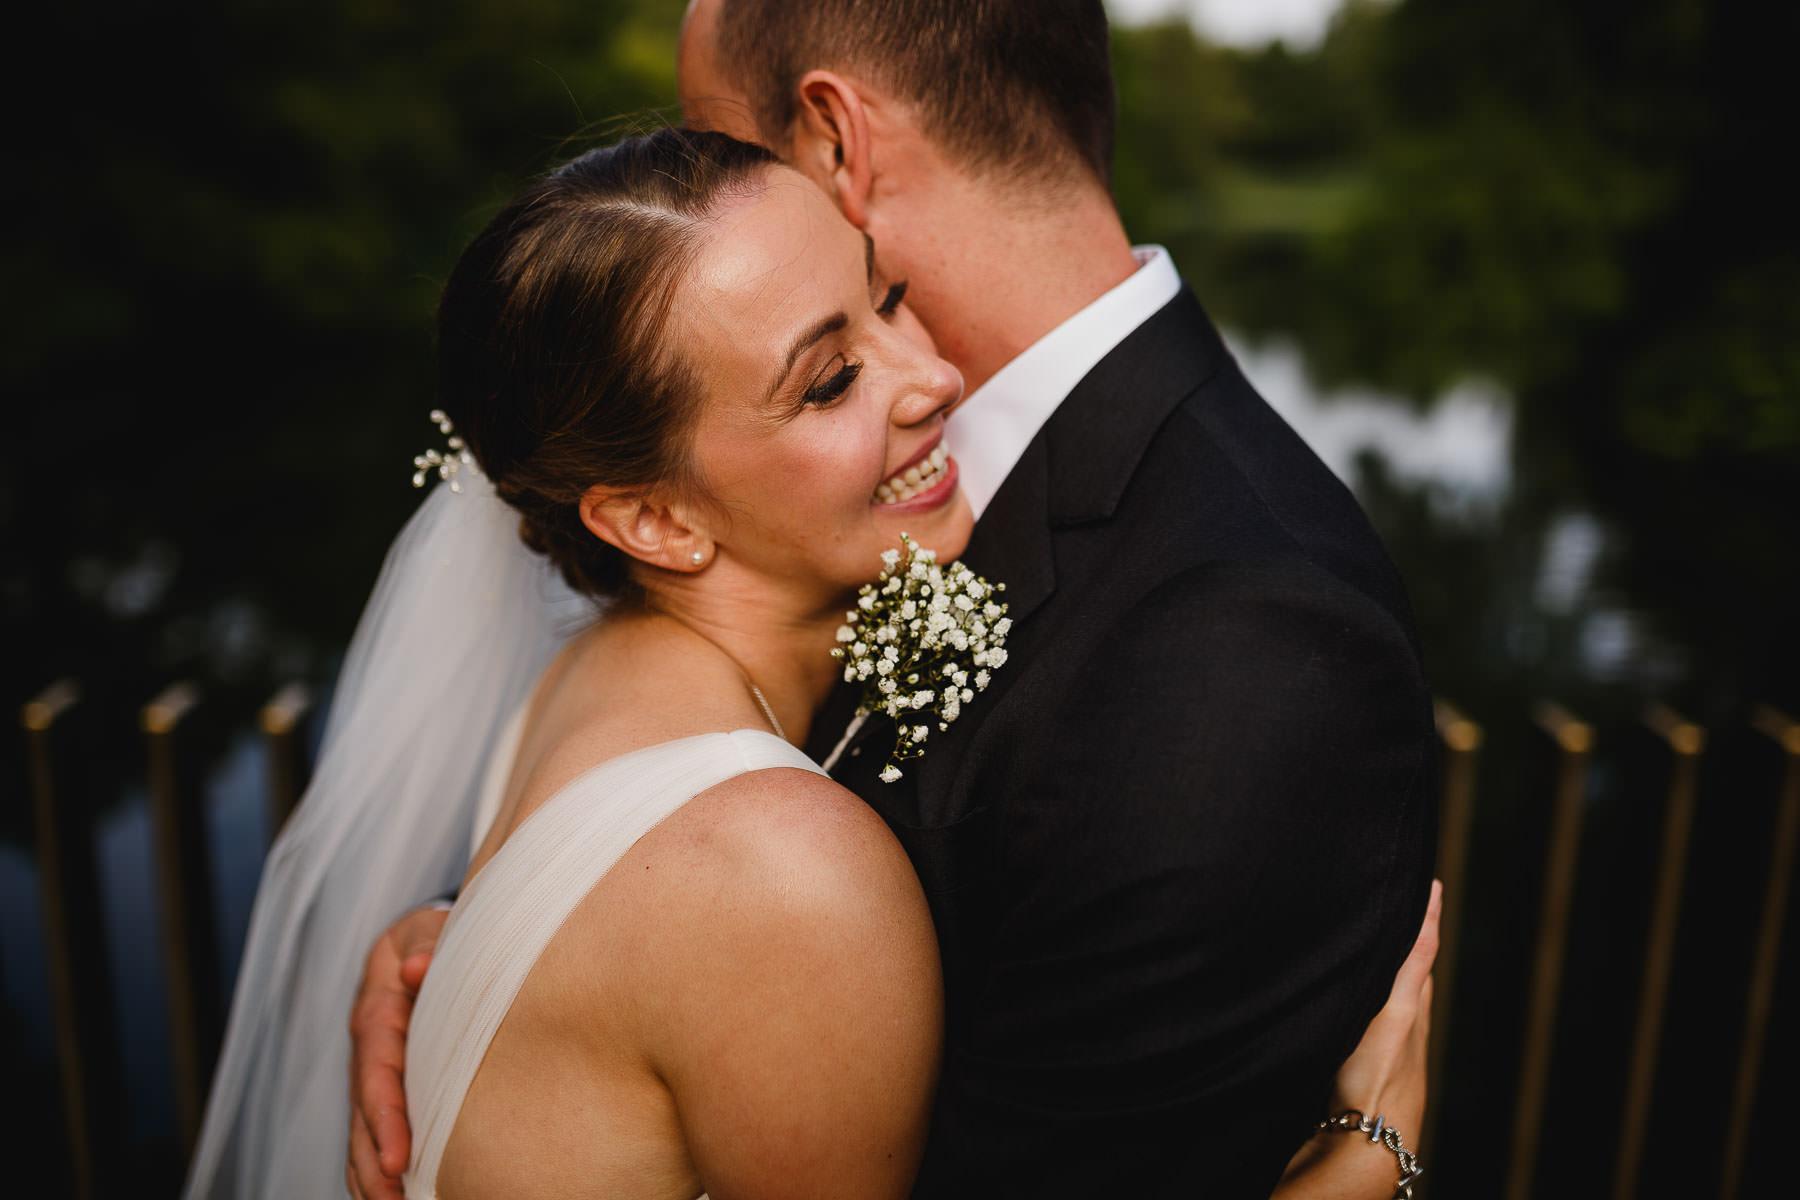 kew gardens wedding photography astra duncan46